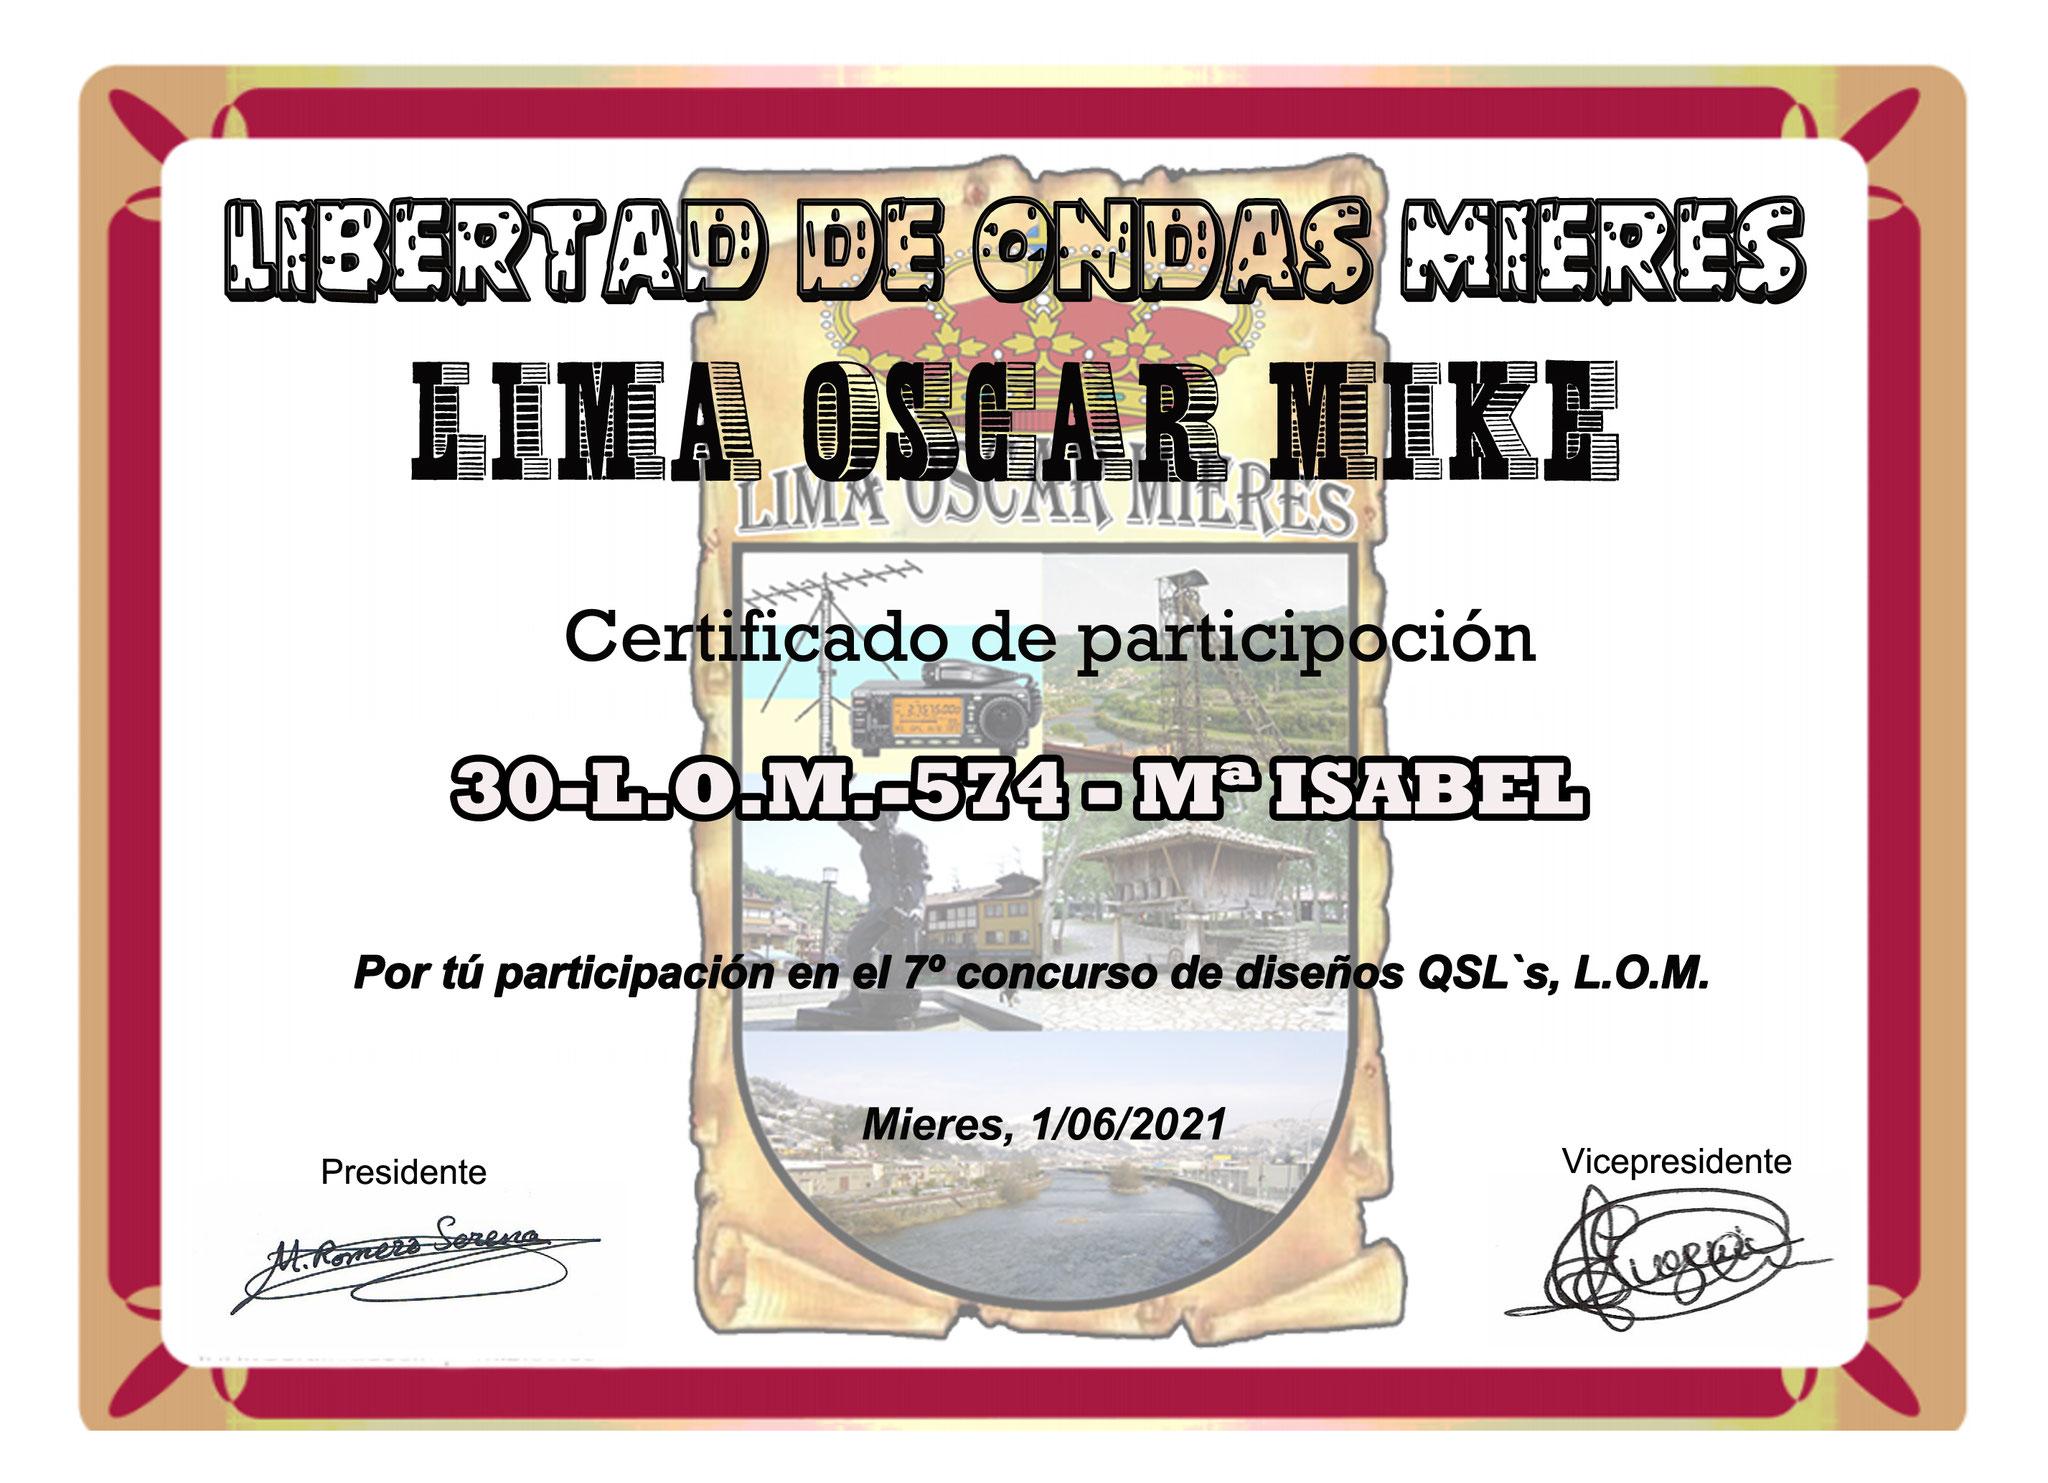 30-L.O.M.-574 ISA - CORDOBA